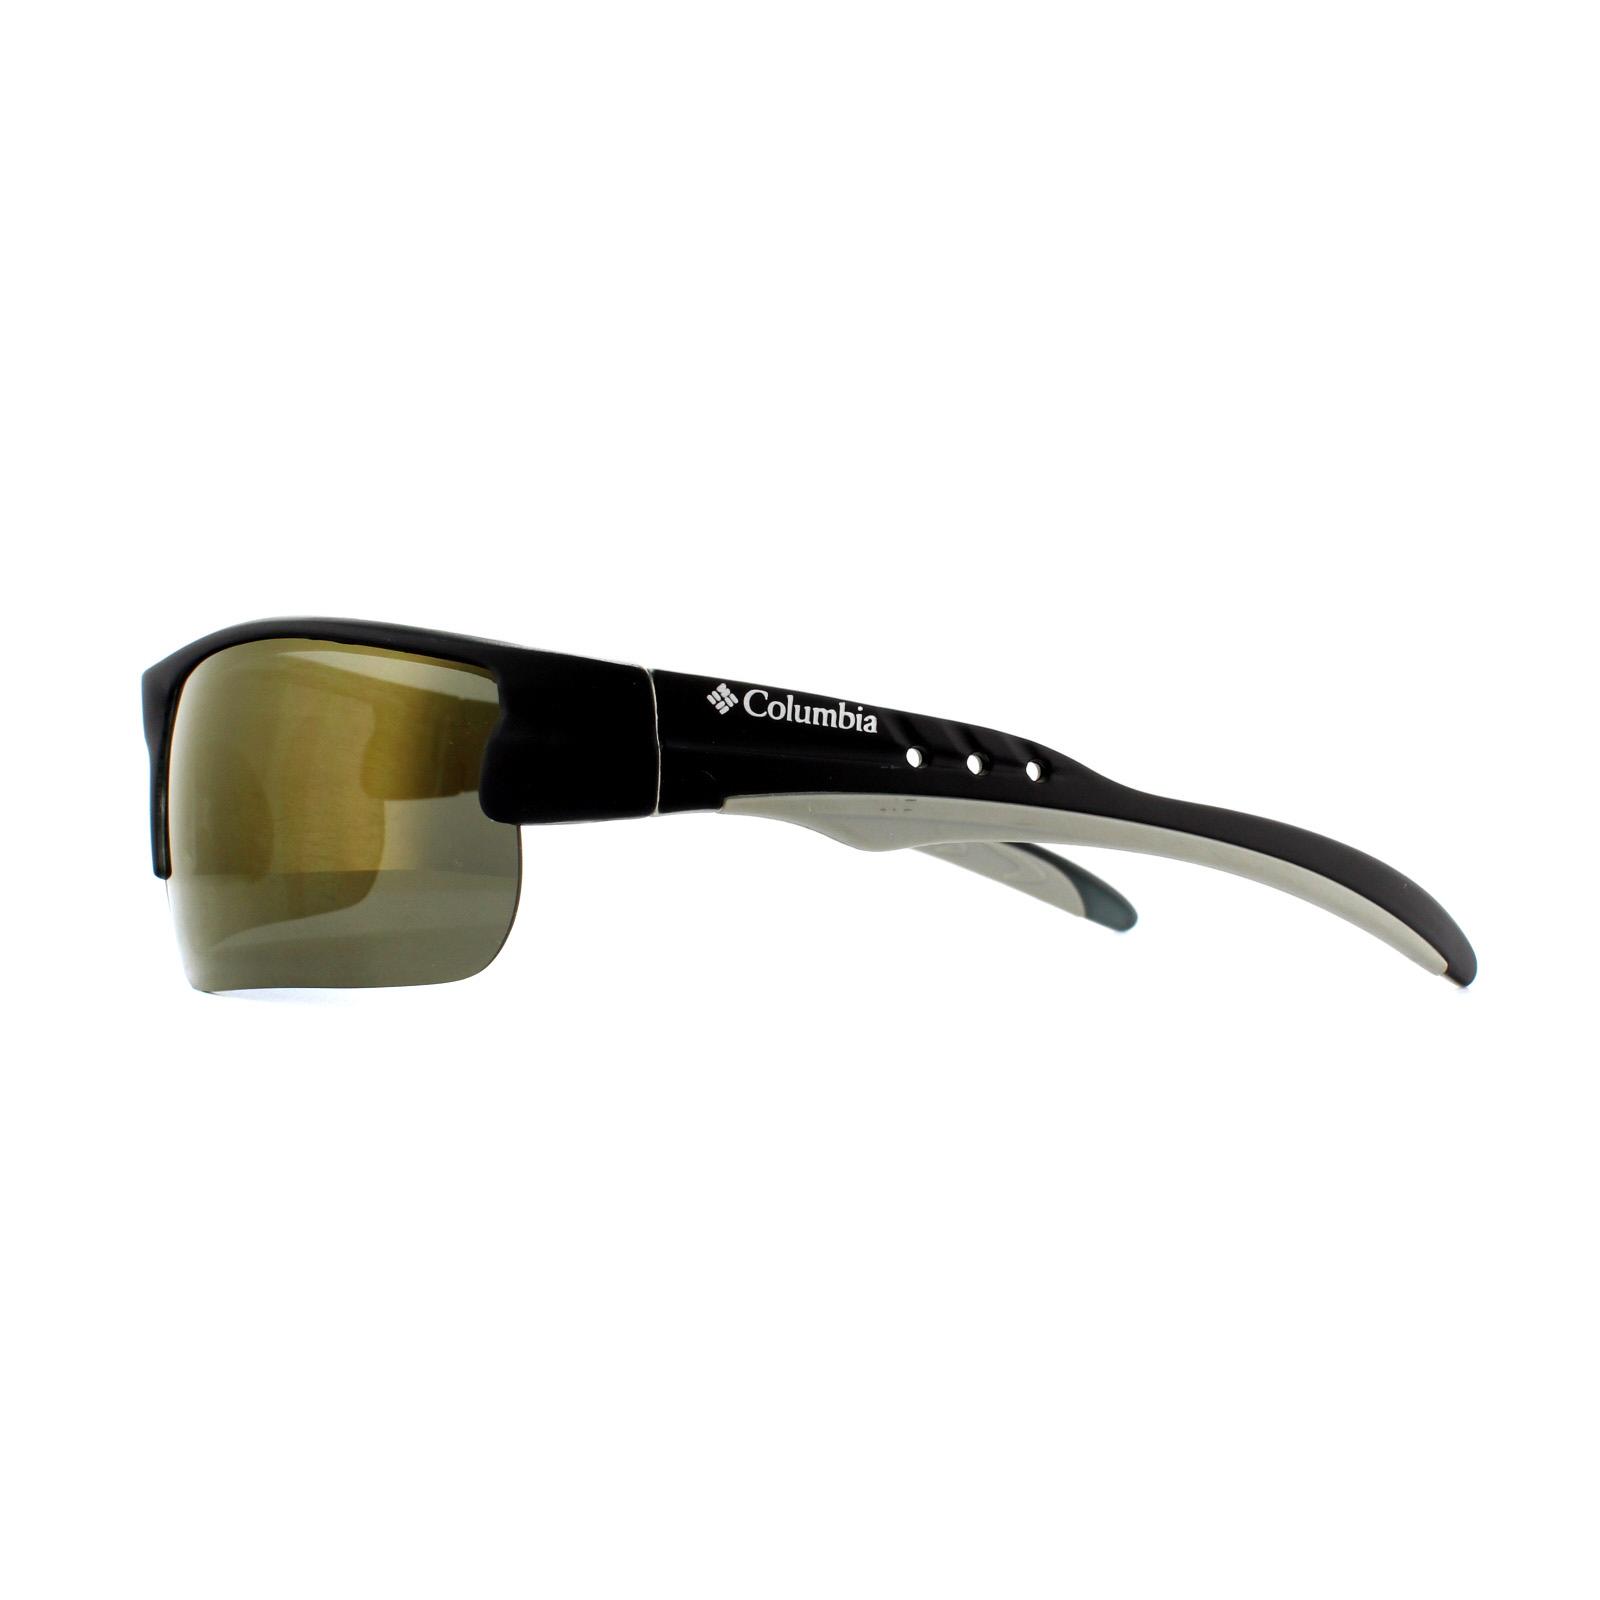 Columbia Sunglasses 903 03 Matte Black Brown Polarized